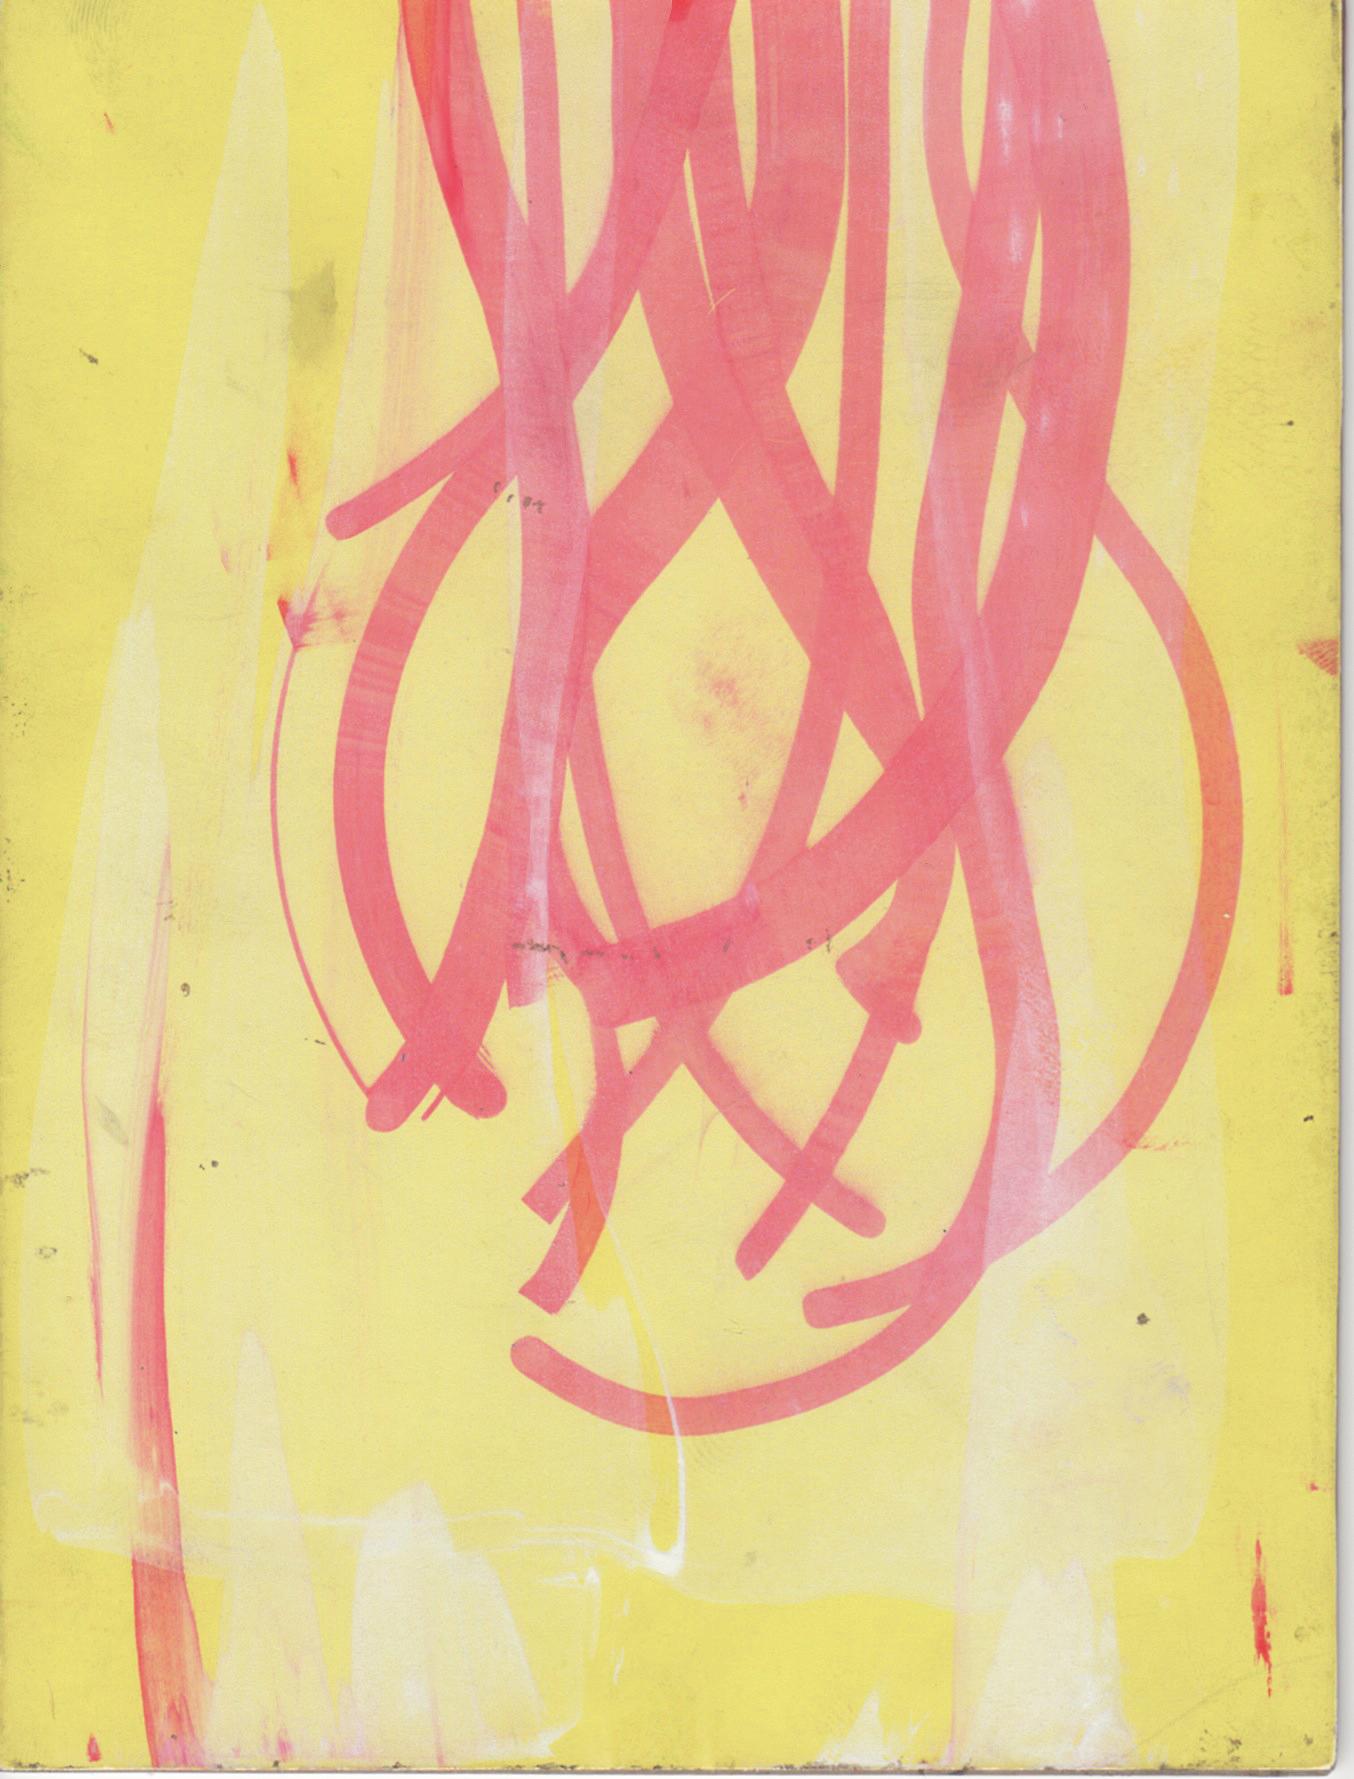 flowchart 8,  2012  ink on paper, 7 x 5 in